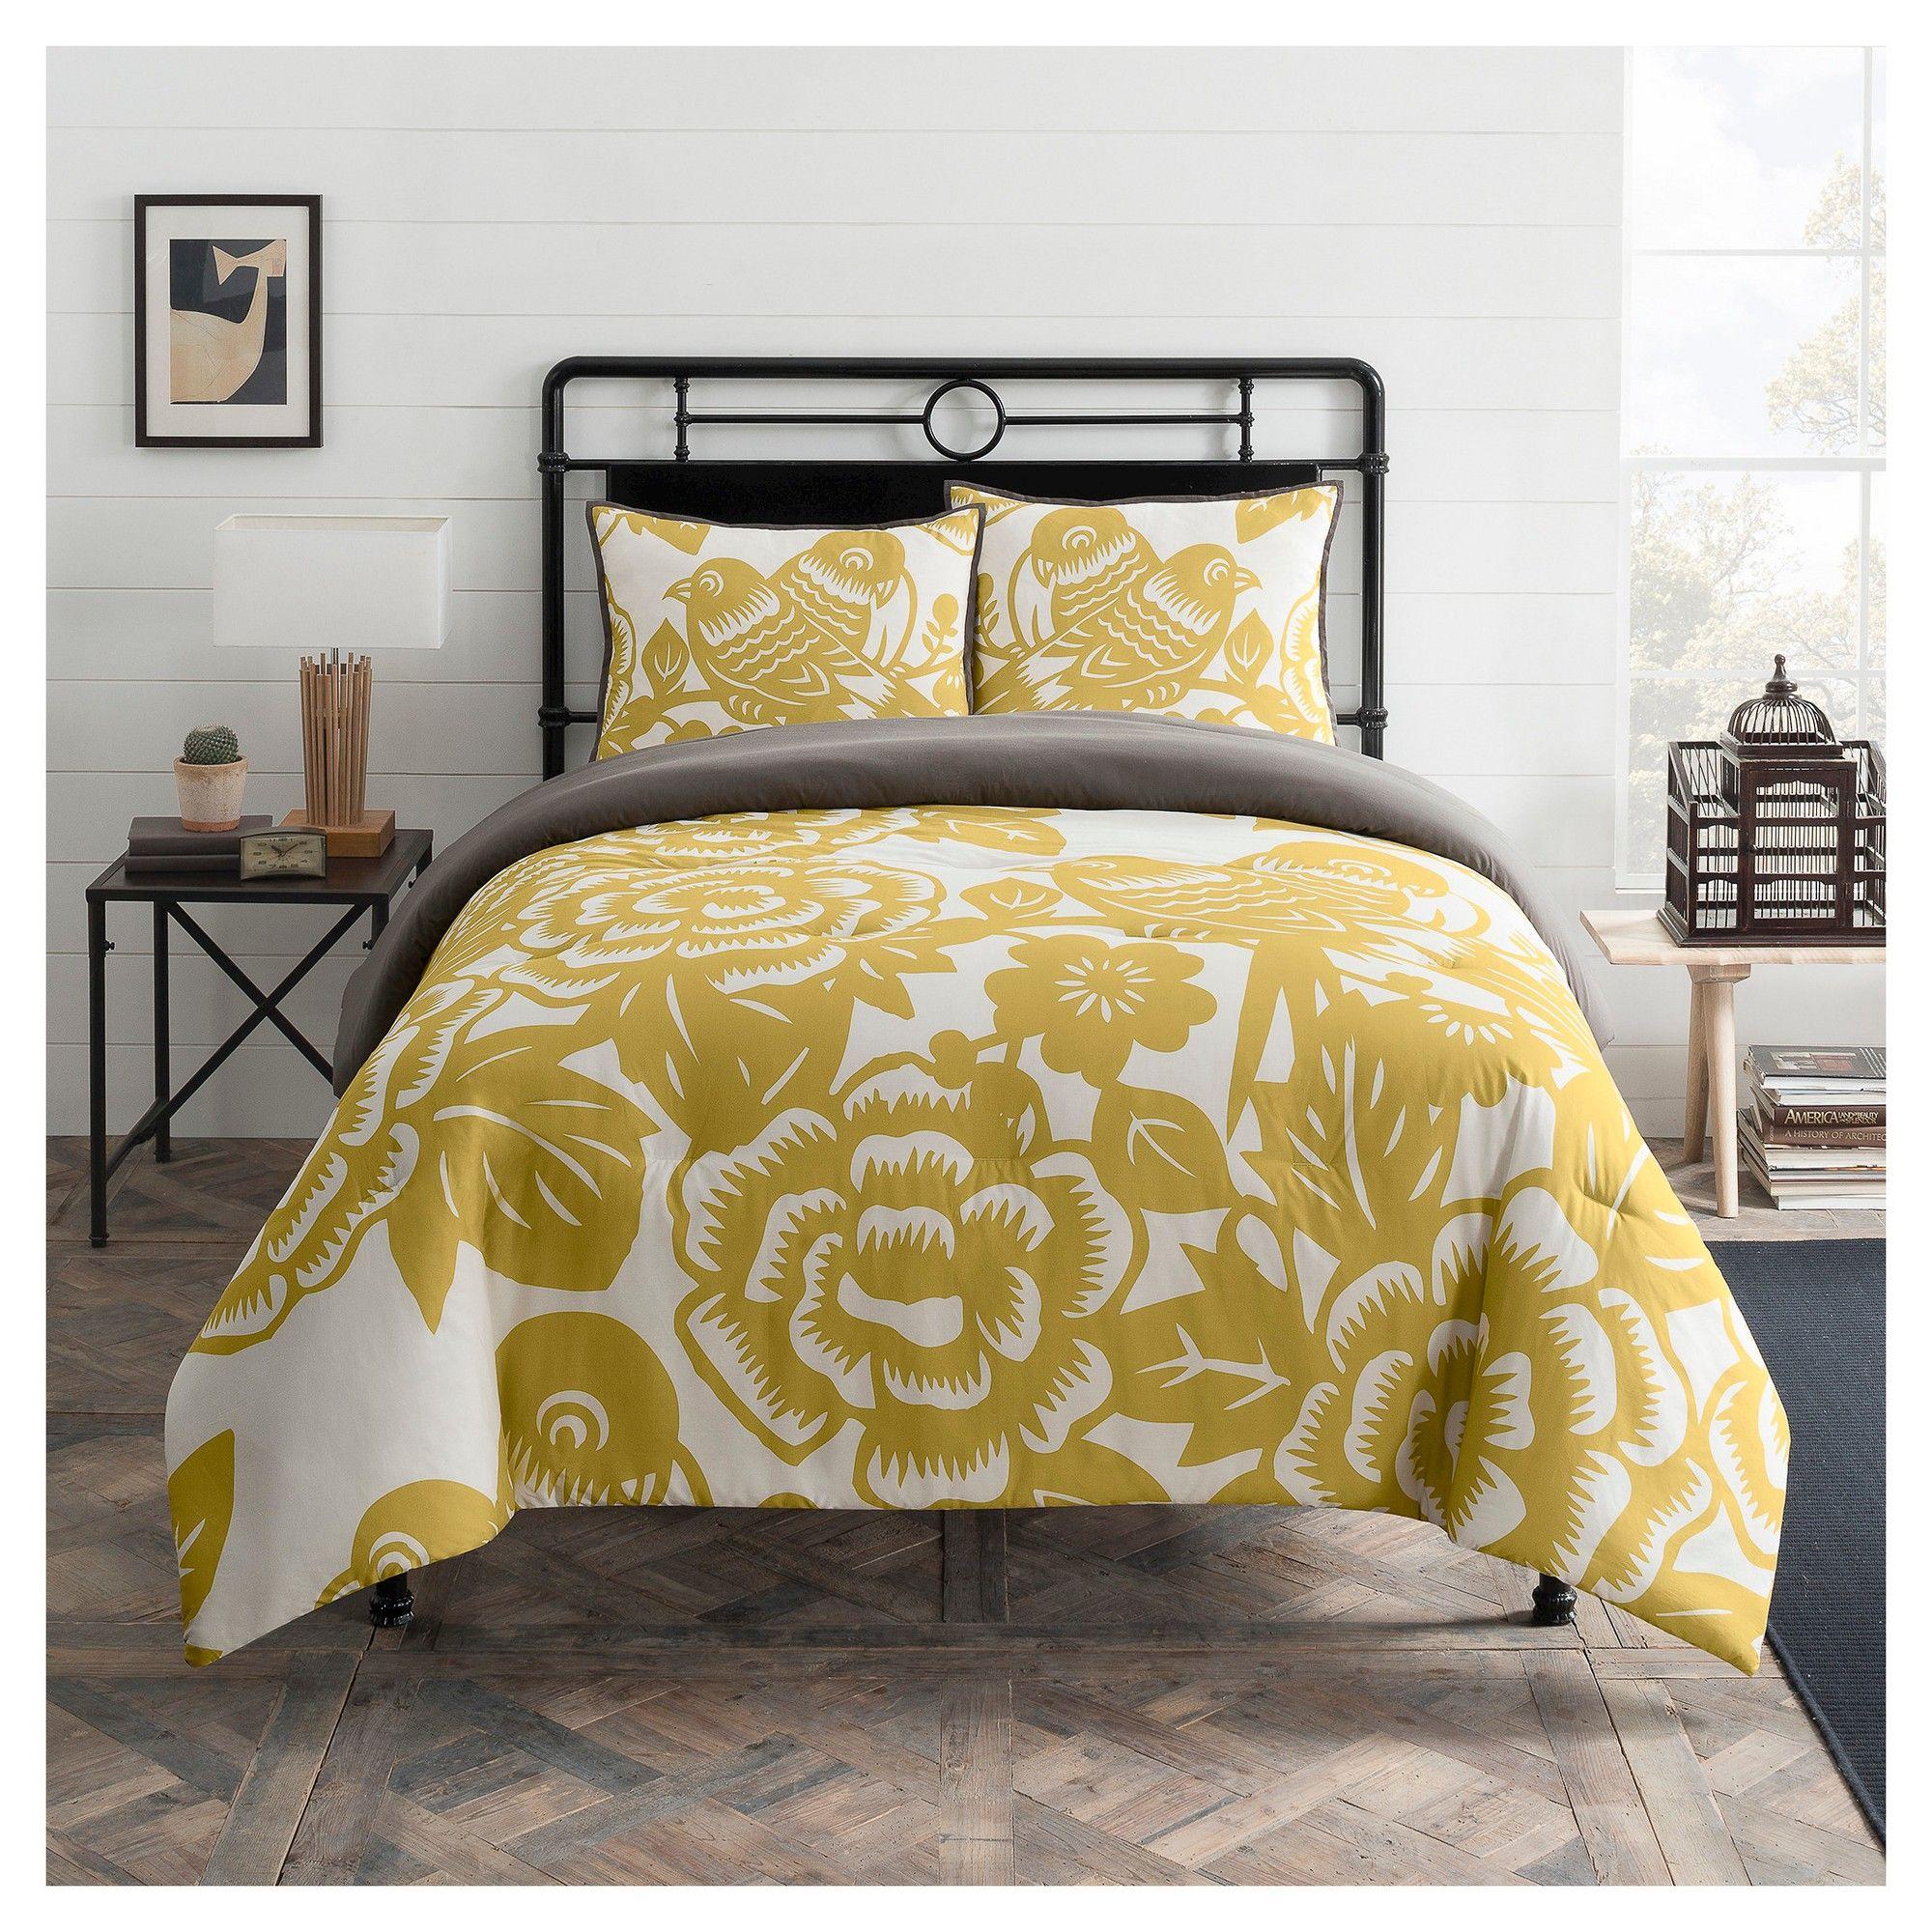 Seedling By Thomaspaul Aviary Floral Print Comforter Set Mustard